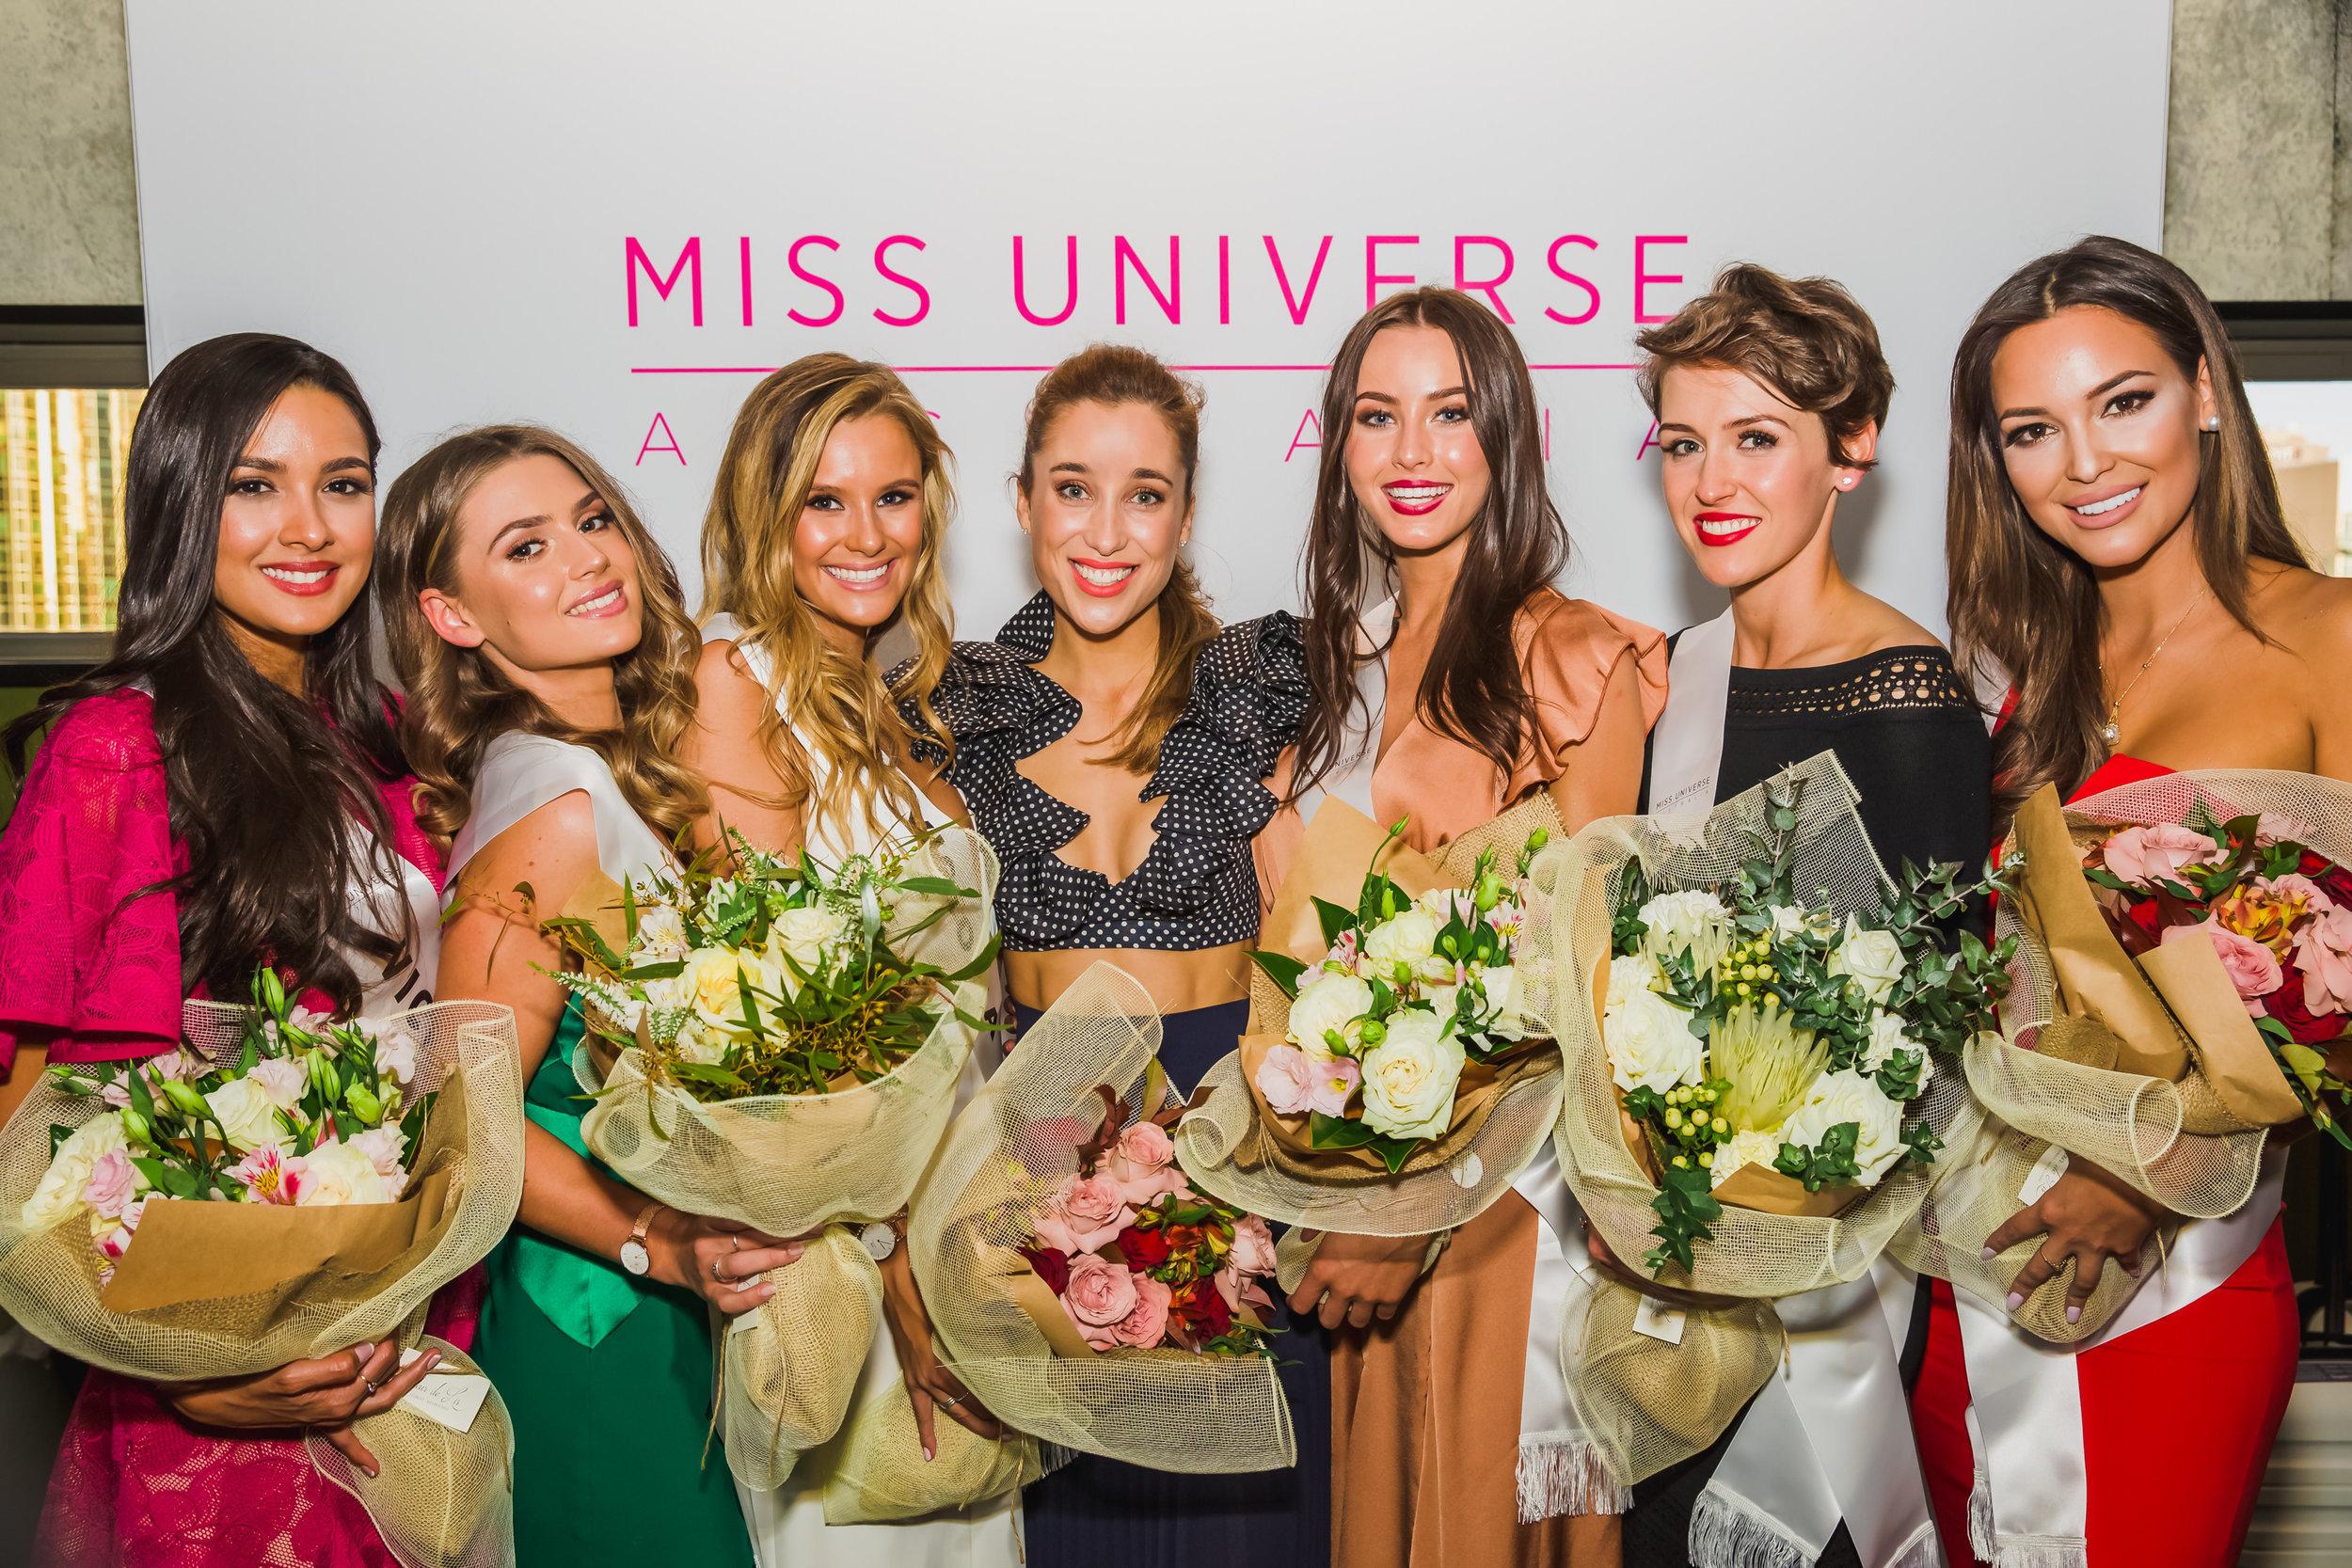 2018.04.22 MISS UNIVERSE - VIC-122.jpg